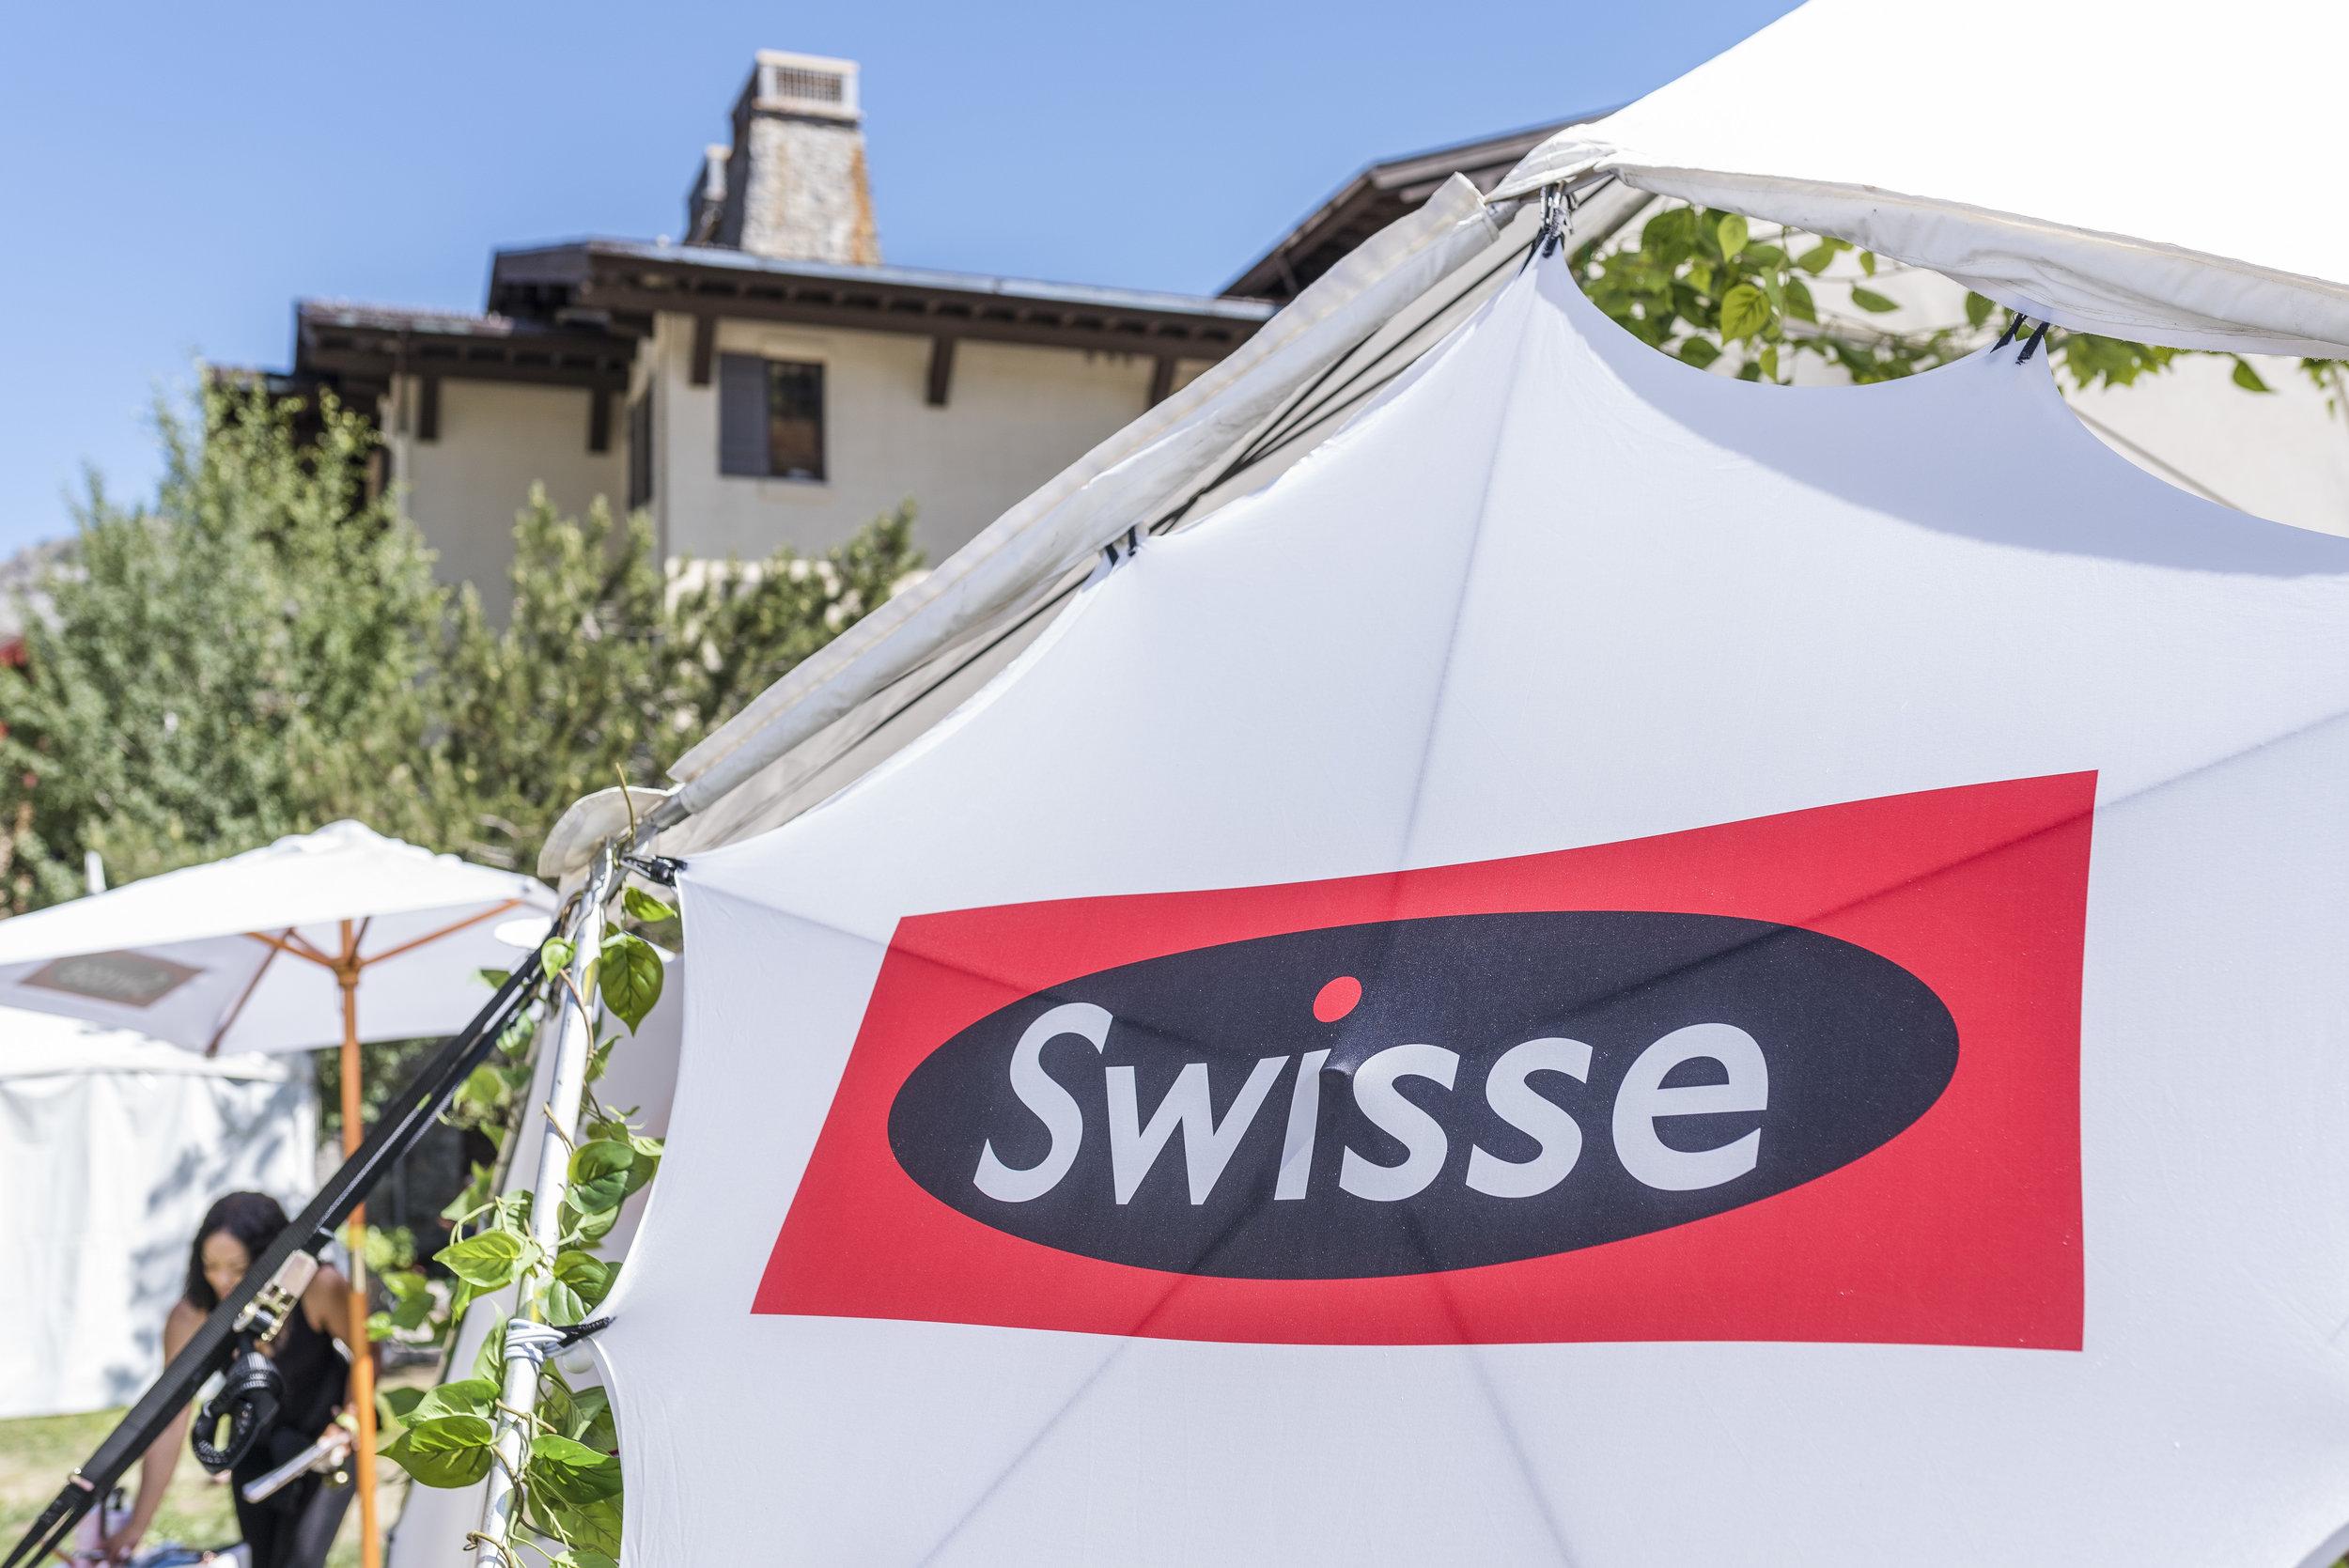 OHelloMedia-Swisse-Wanderlust1.jpg